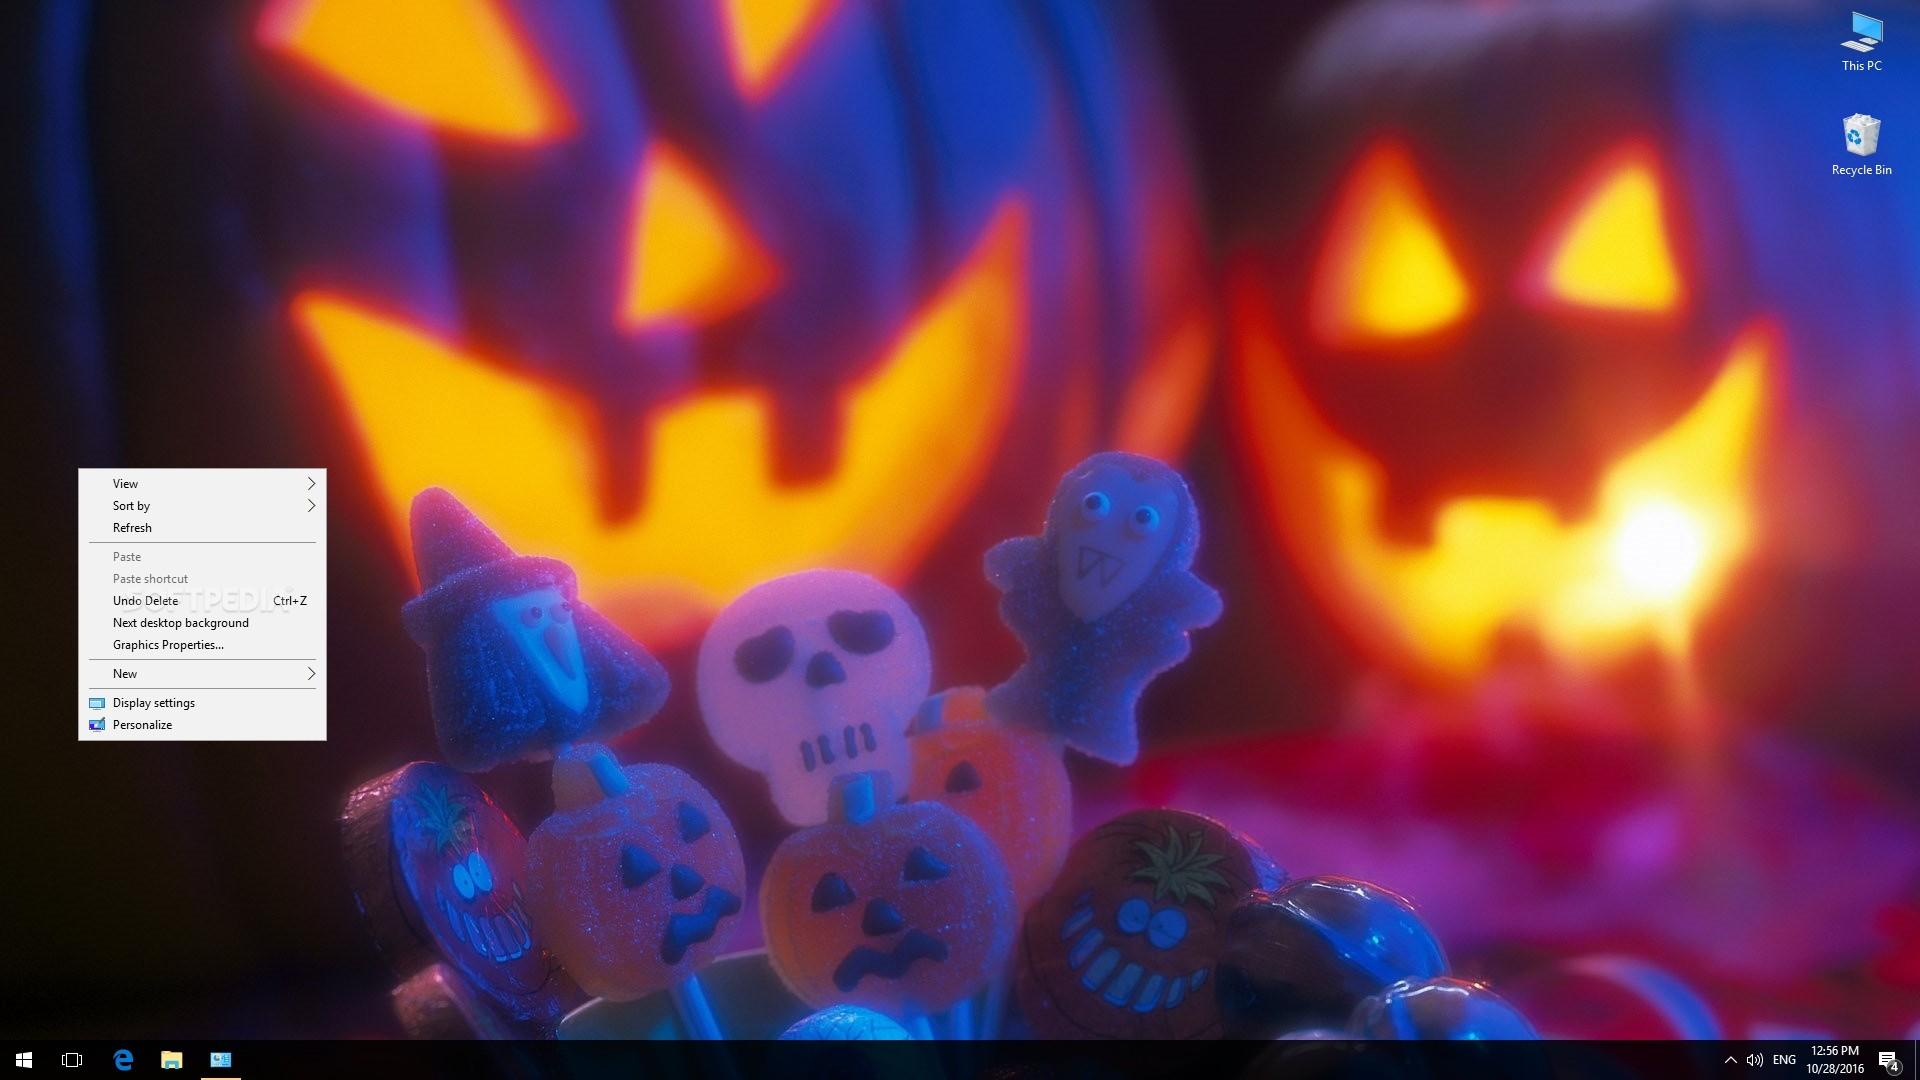 Halloween Wallpaper Windows - 1920x1080 ...